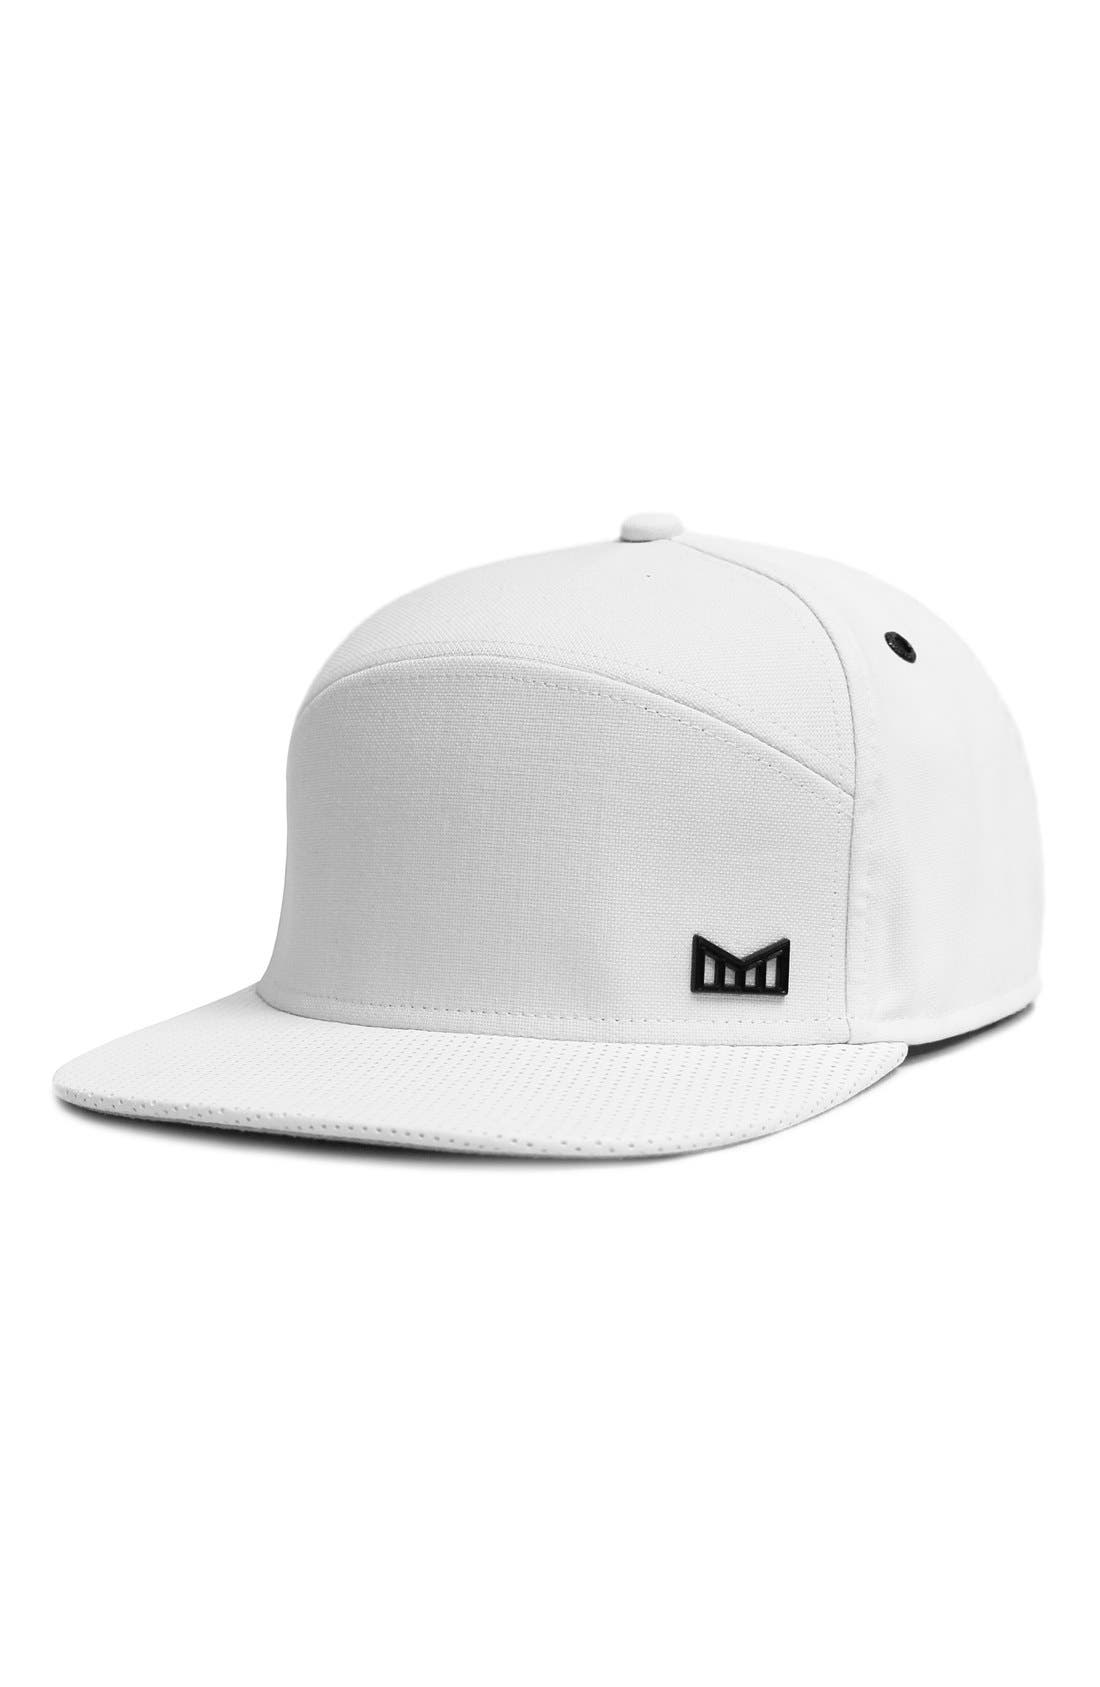 'The Vision' Horizon Fit Flat Brim Baseball Cap,                             Main thumbnail 1, color,                             White